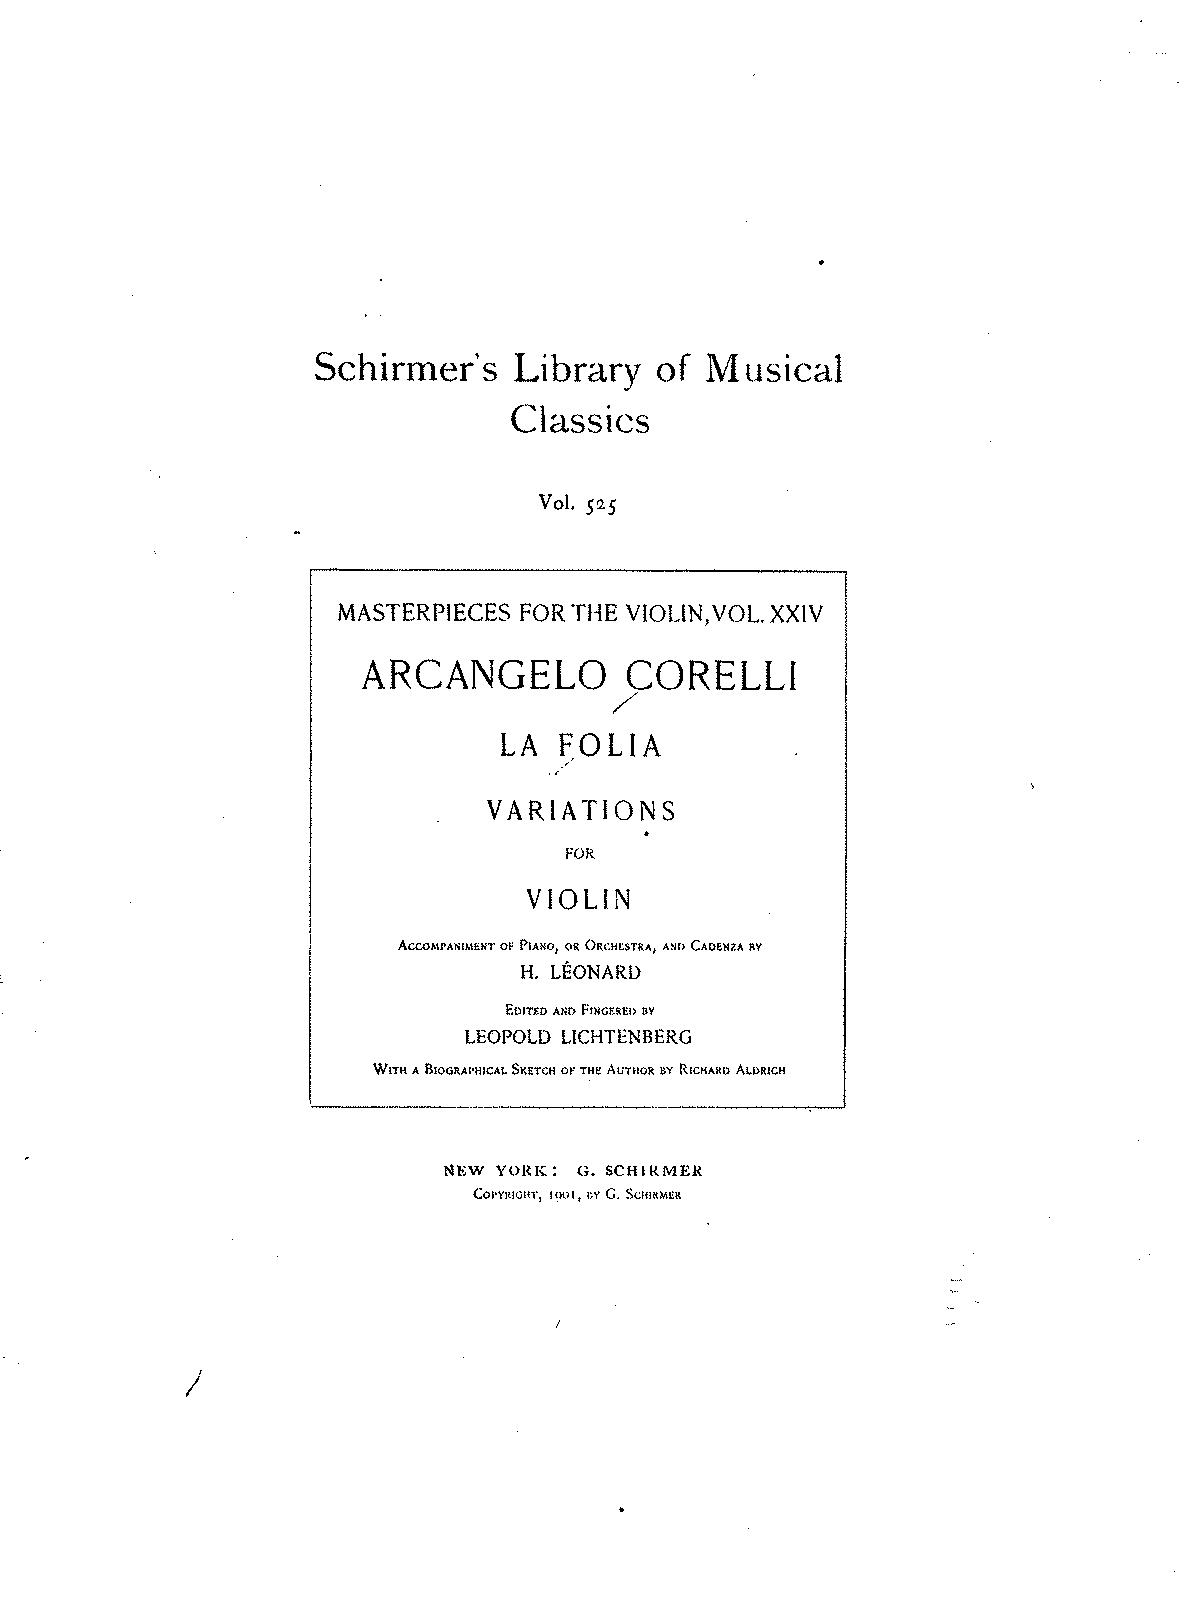 la folia corelli suzuki pdf